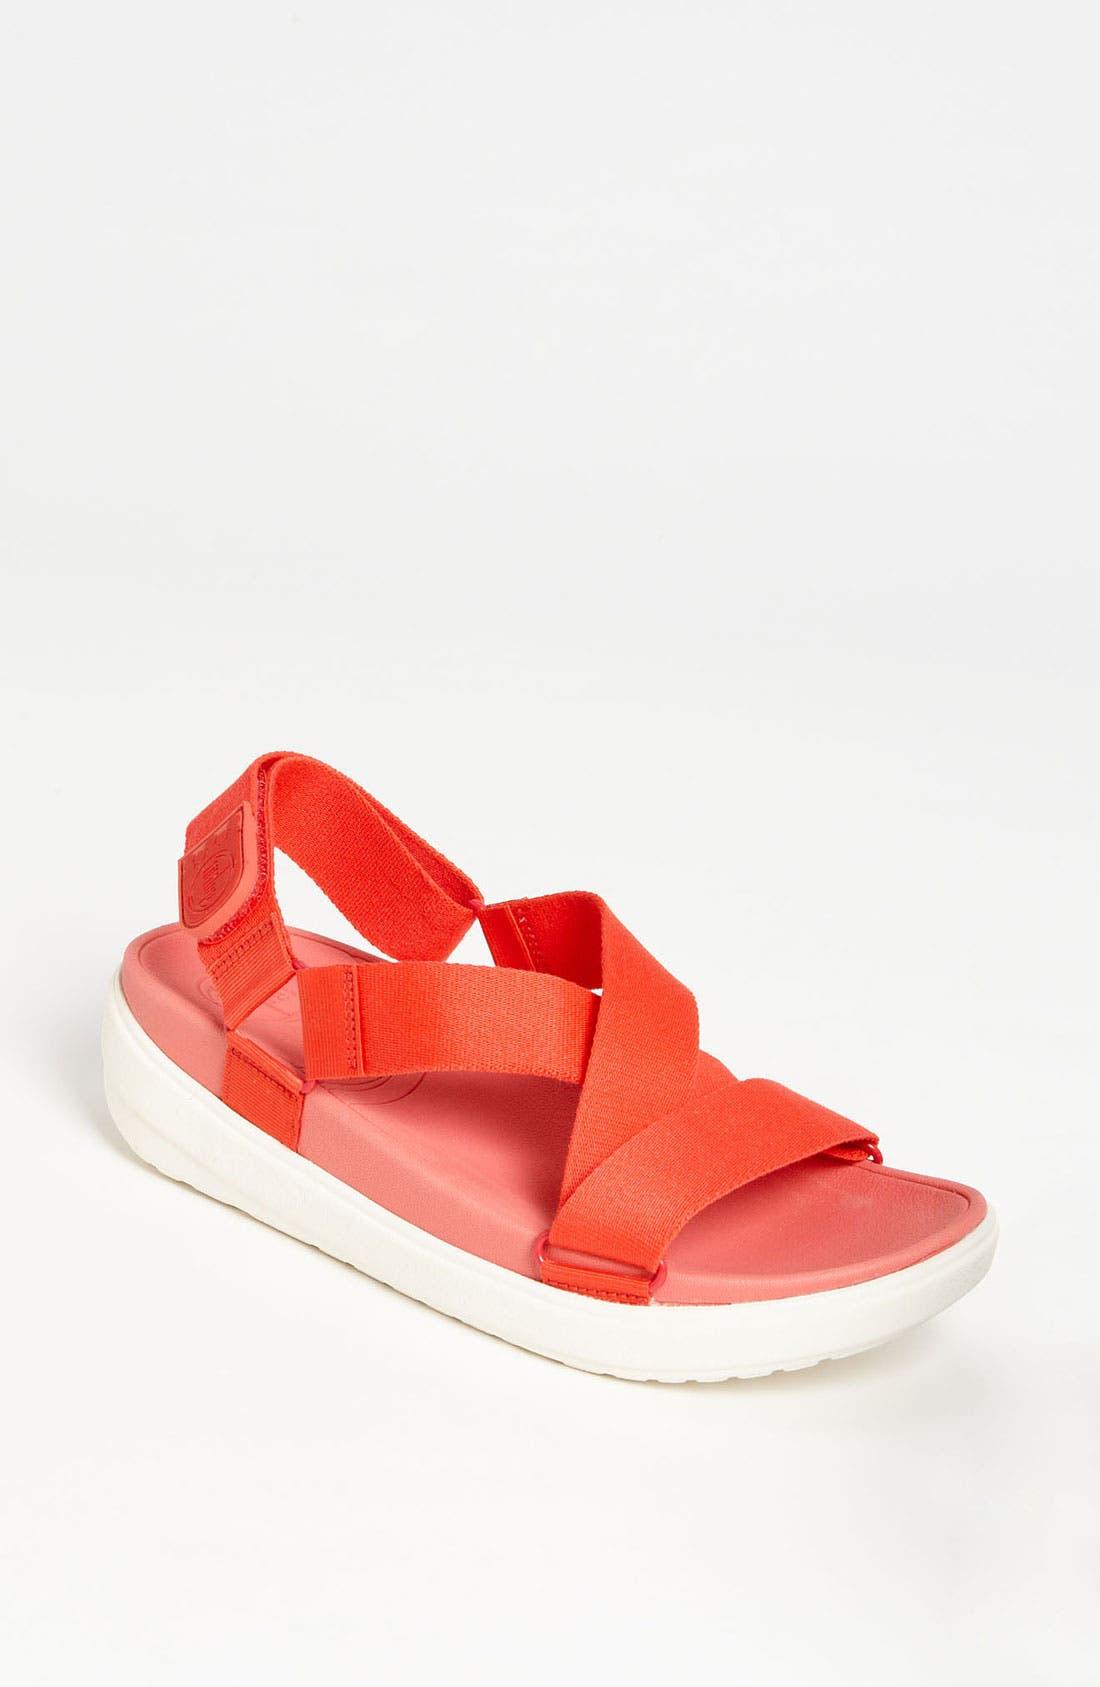 Main Image - FitFlop 'Sling' Sandal